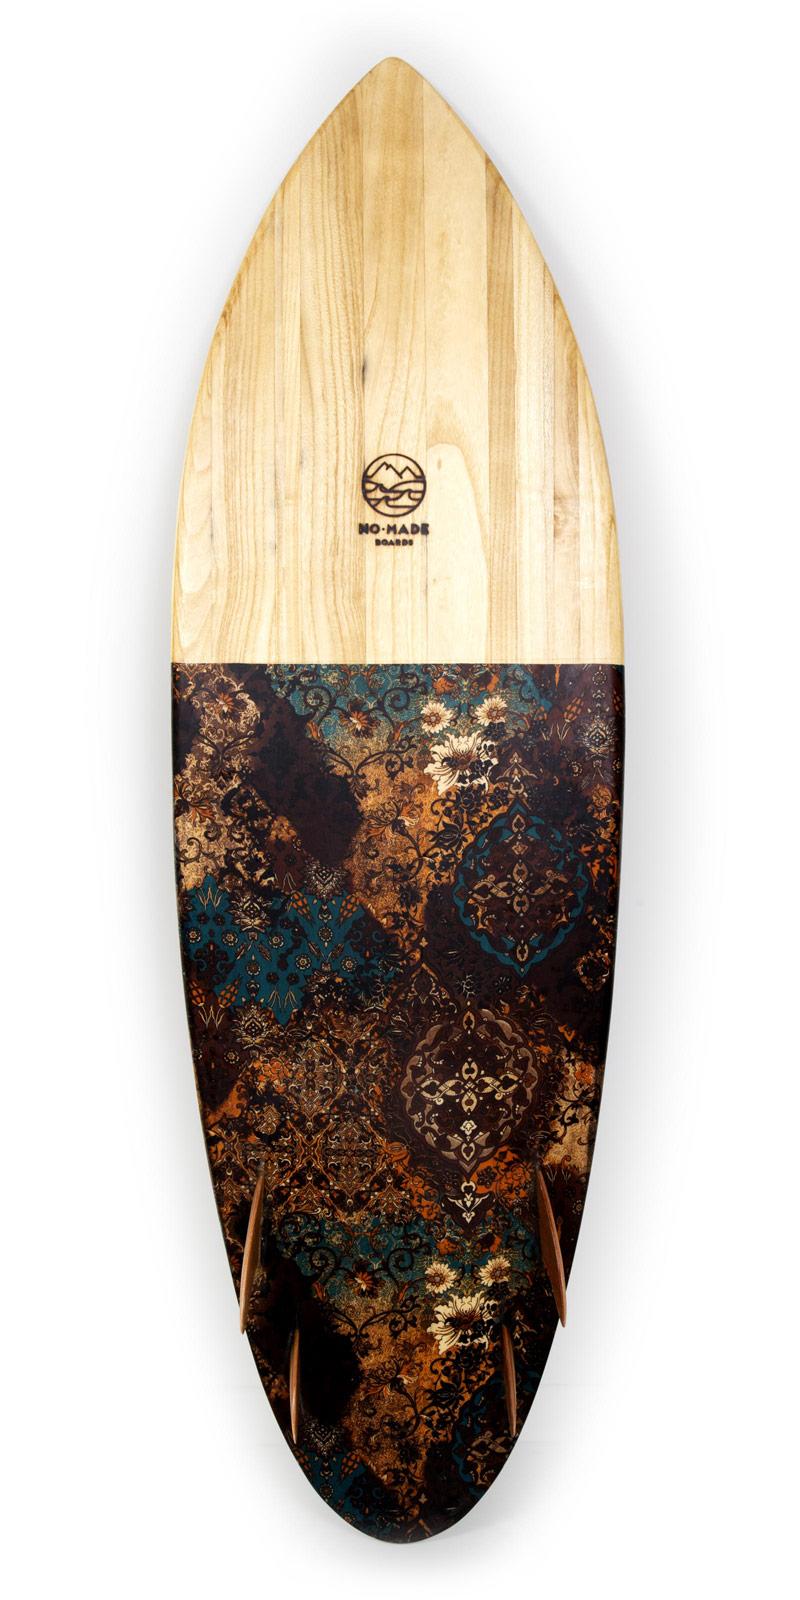 avocado wooden surfboard